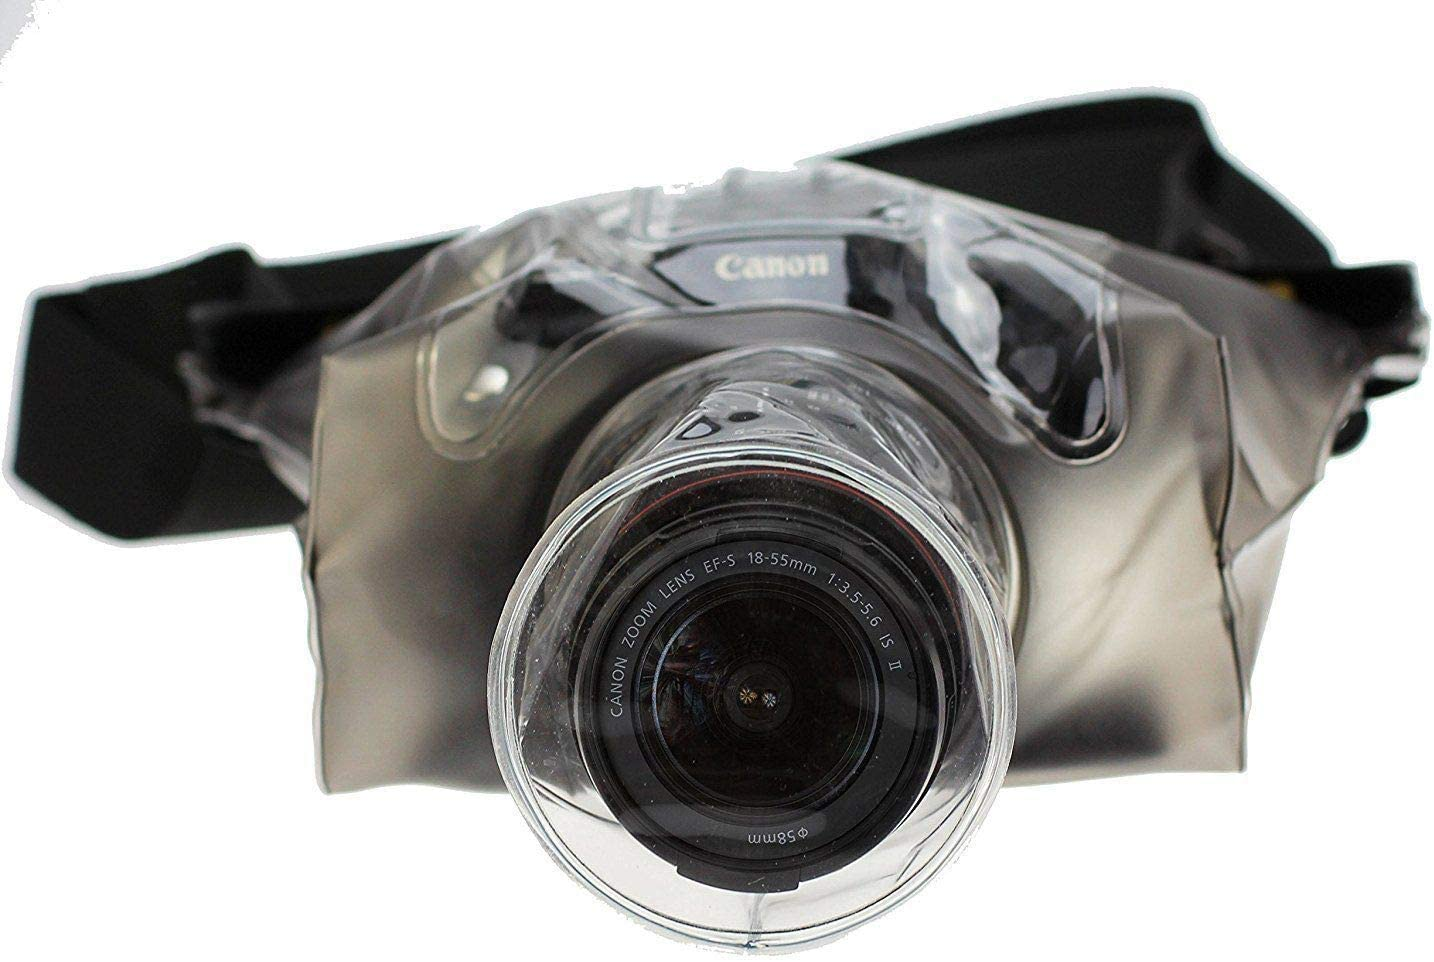 Navitech Blue/DSLR SLR Waterproof Underwater Housing Case//Cover Pouch Dry Bag Compatible with The/Kodak PIXPRO AZ528